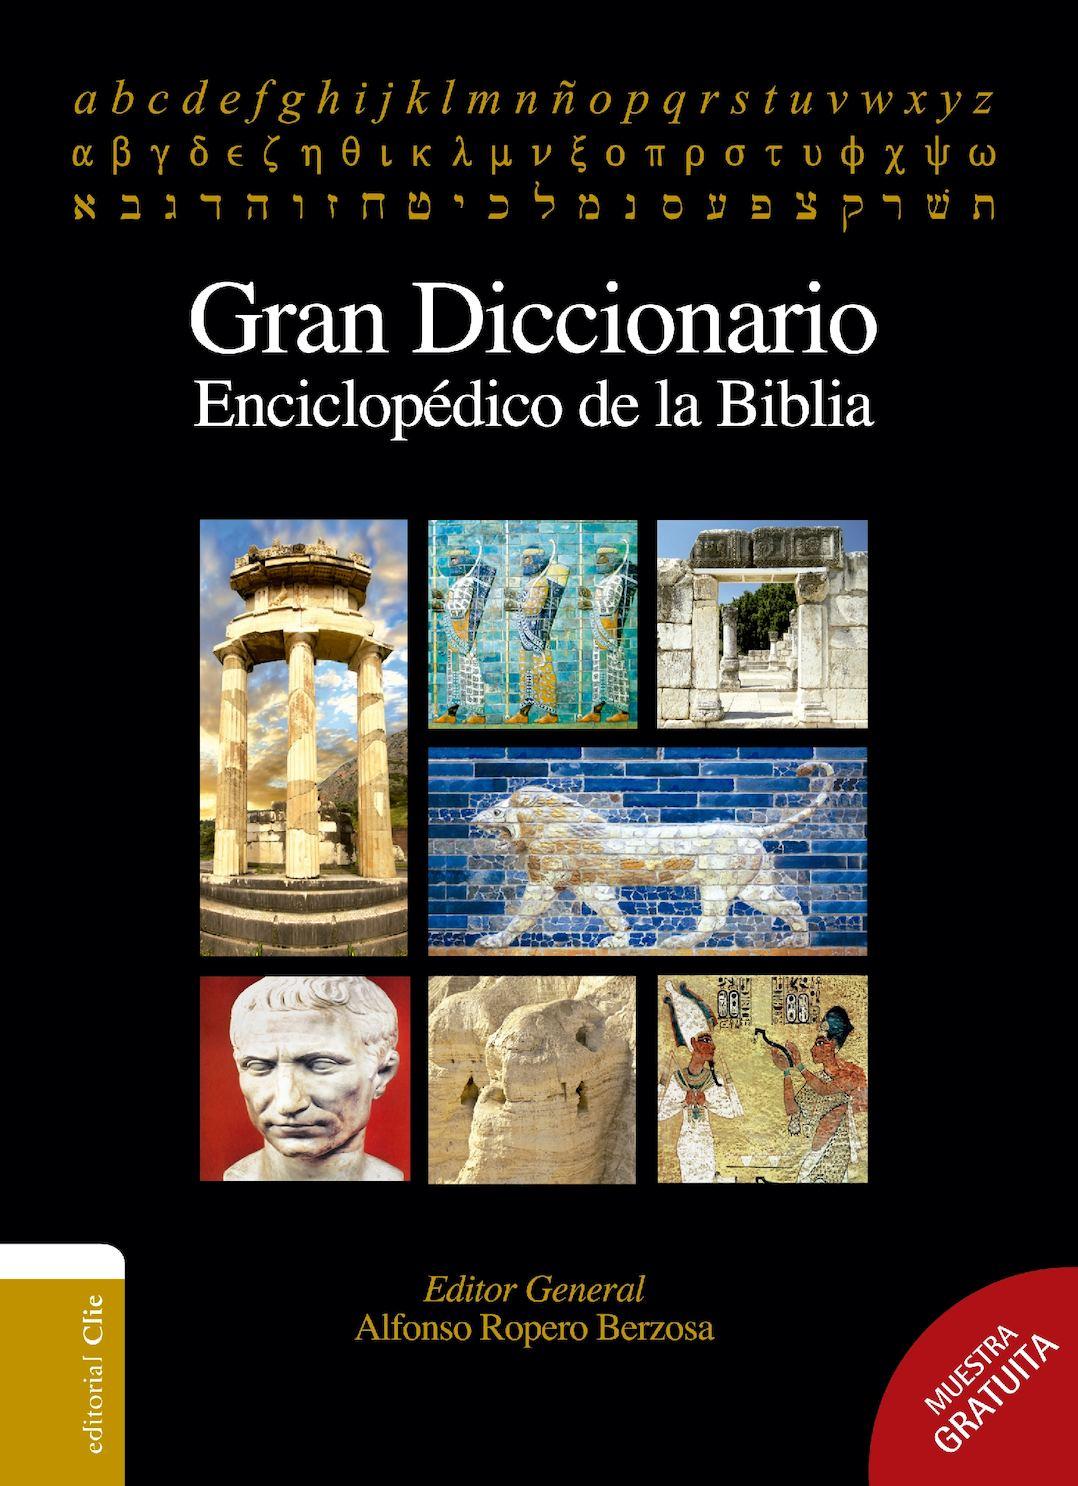 Importancia de la encyclopedia de diderot y dalembert betting betting tips today